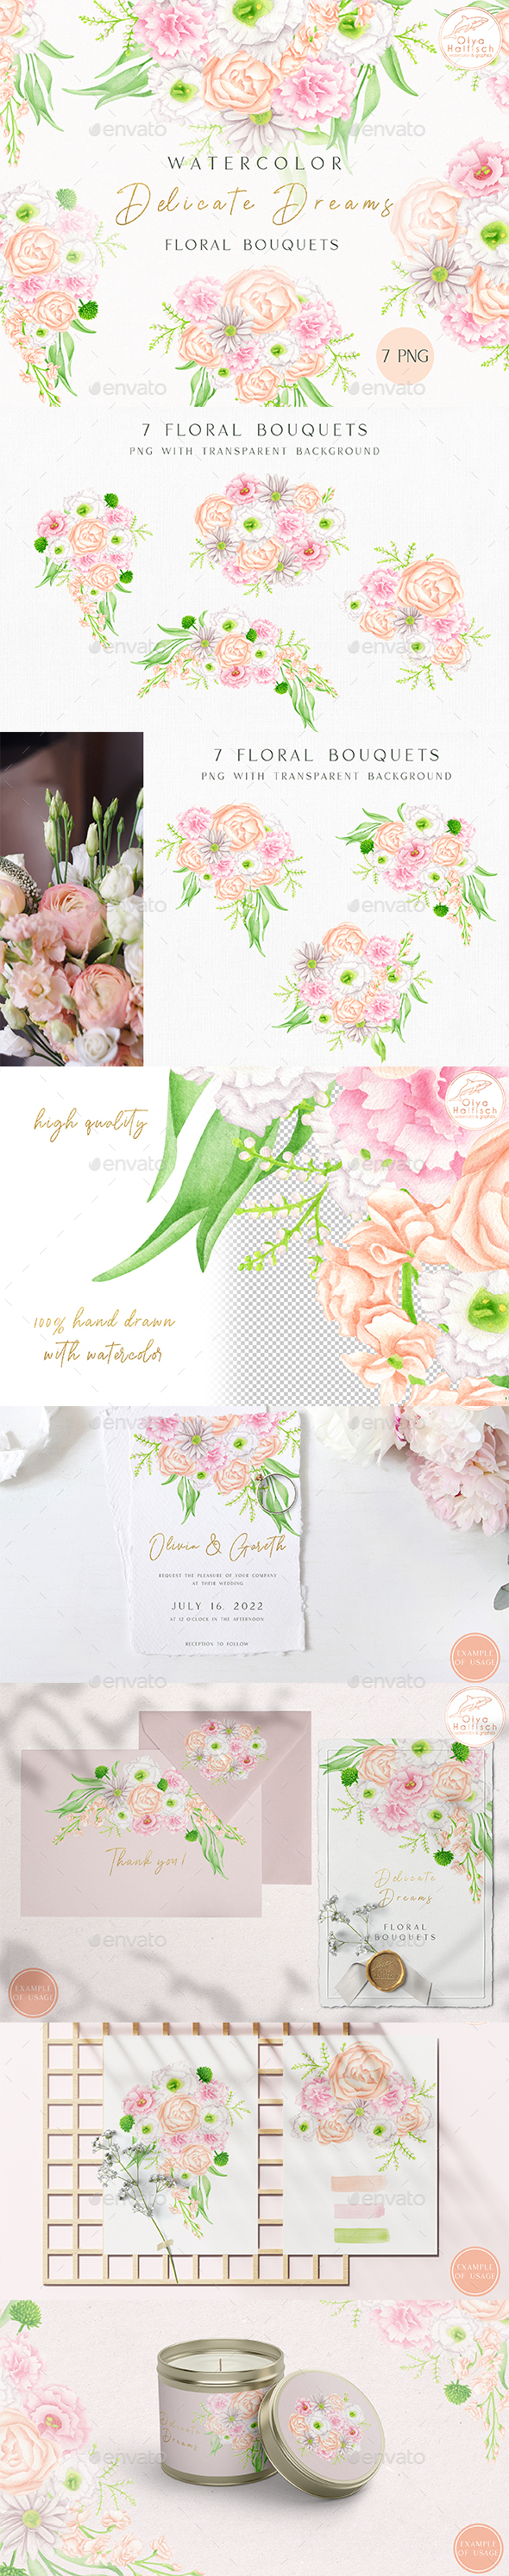 Watercolor Bouquets Clipart. Blush Wedding Flowers PNG